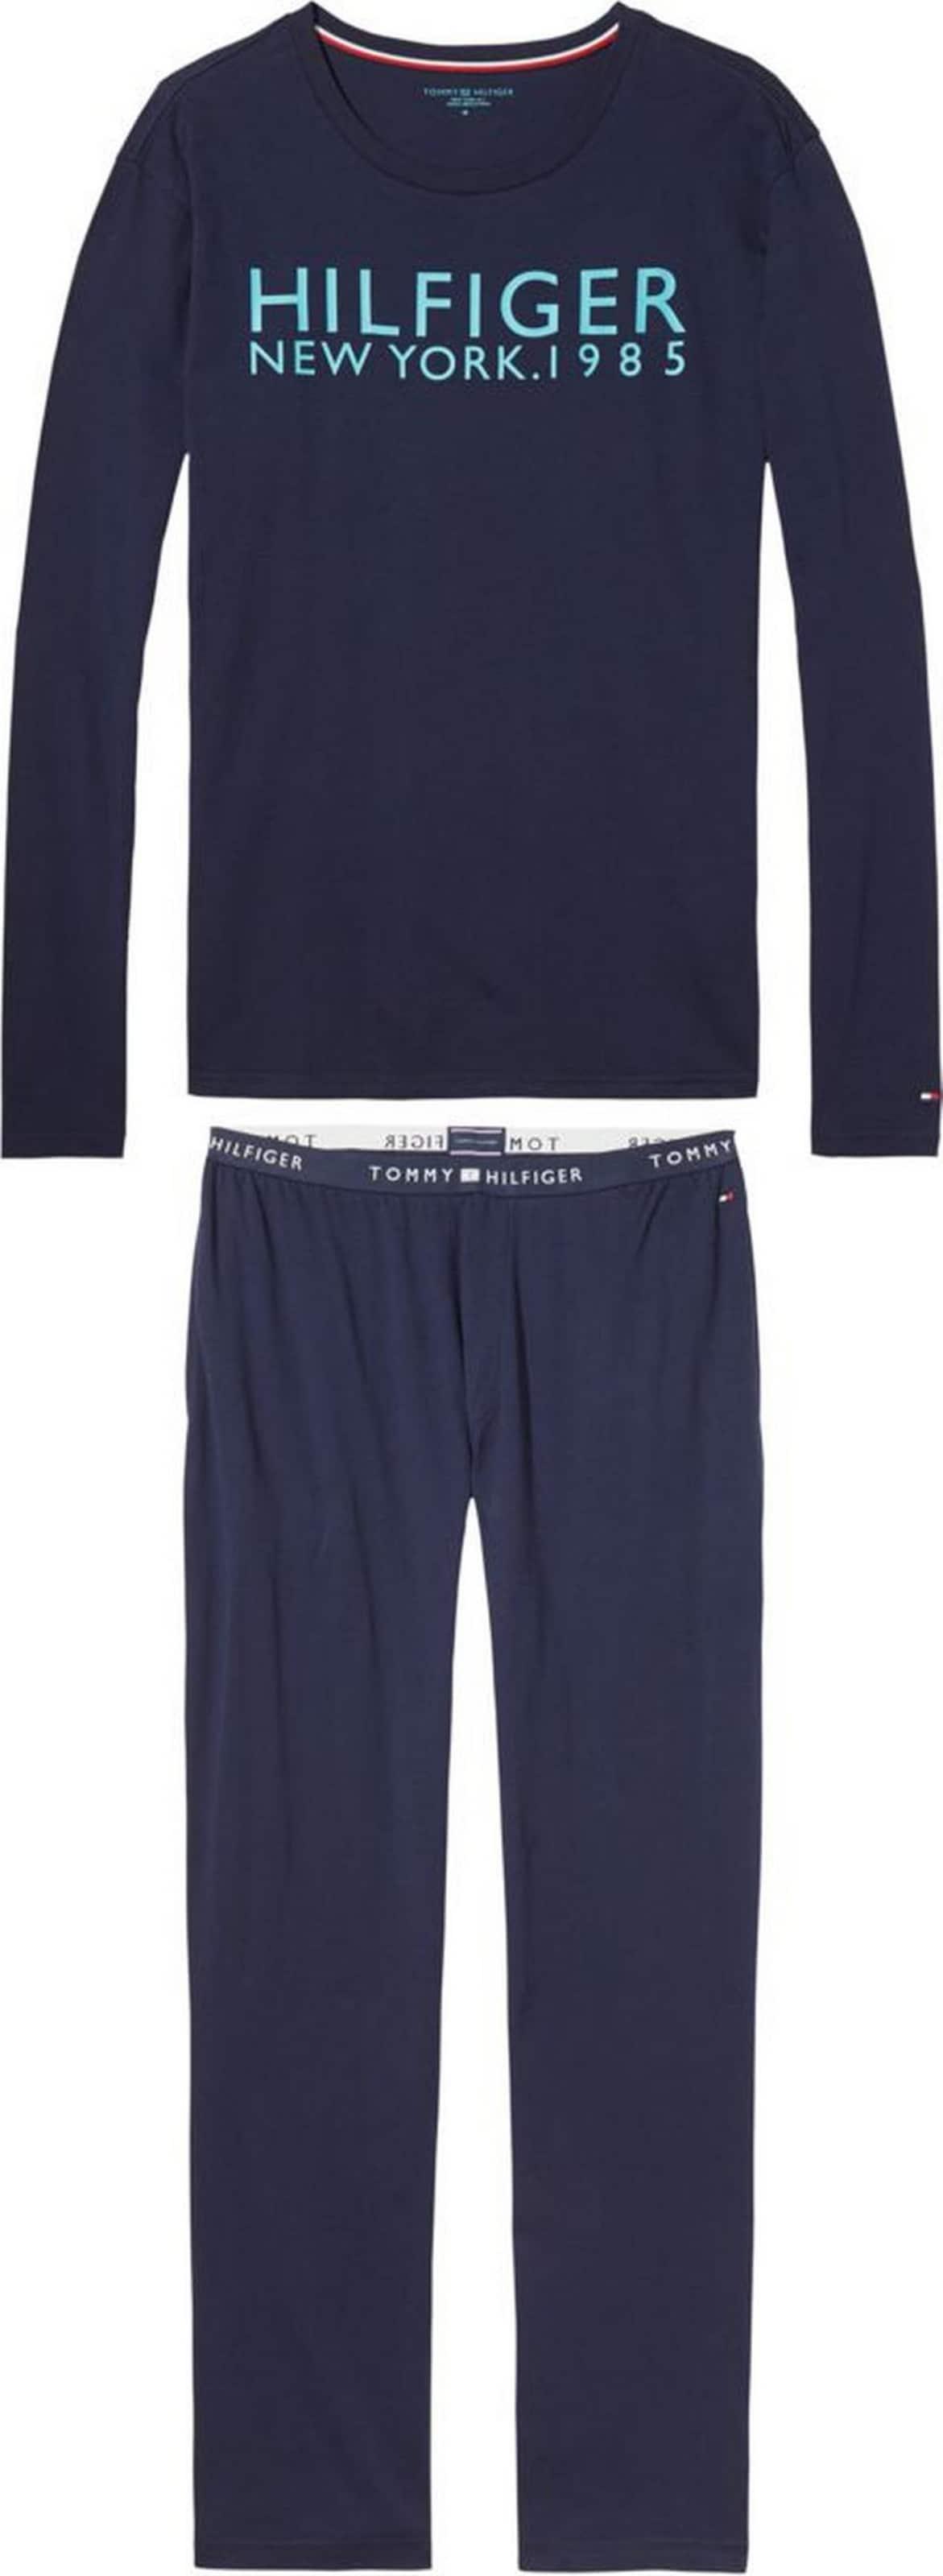 TOMMY HILFIGER Pyjama 'SET LS LOGO' Fälschung Günstig Online QOWSqGG2